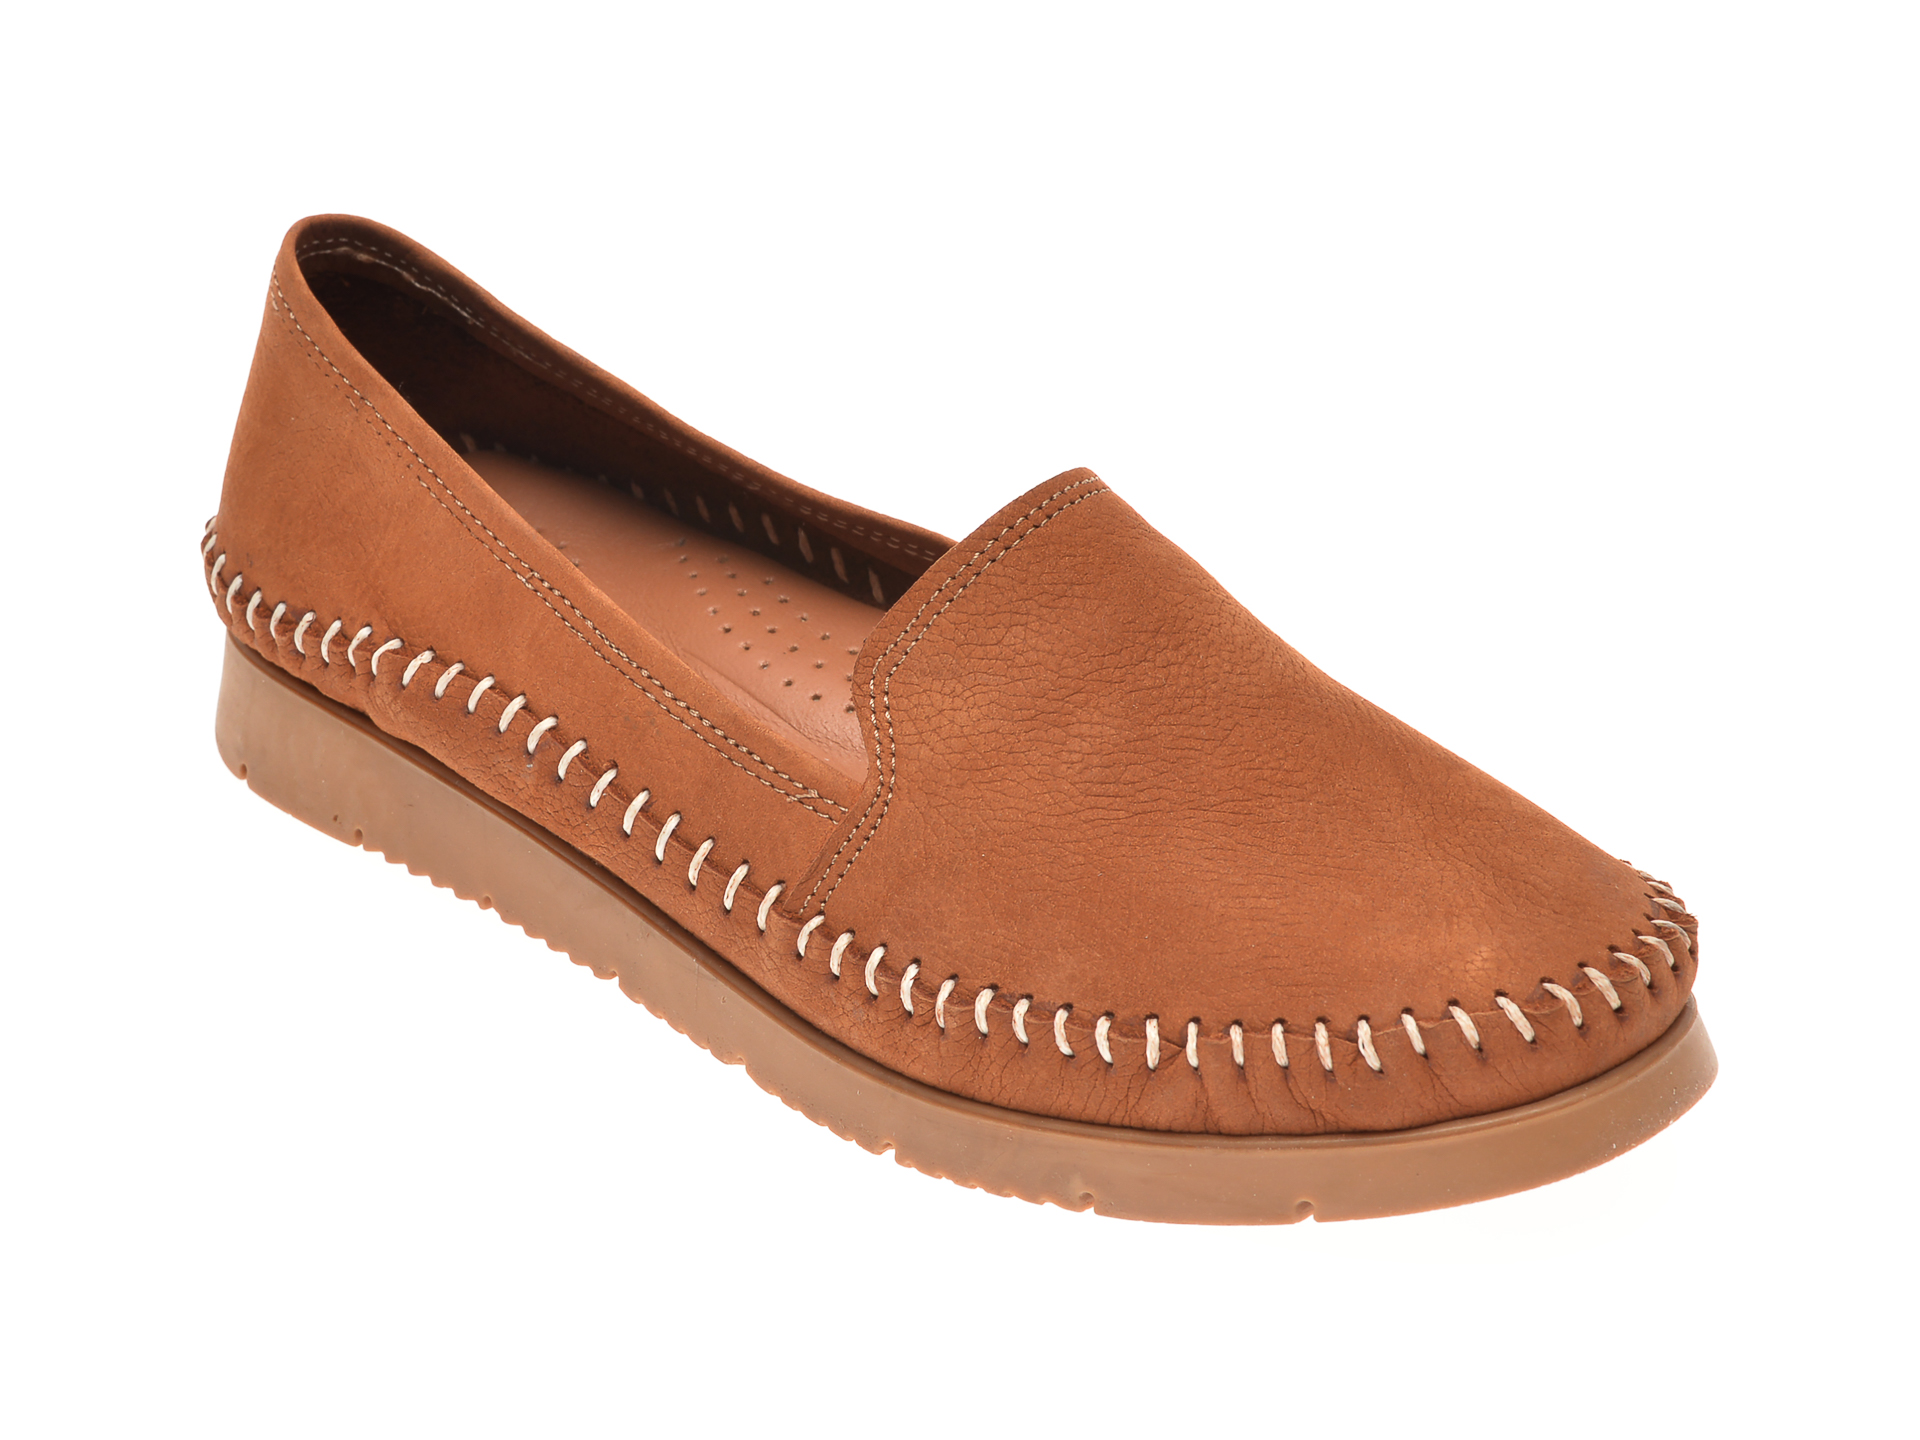 Pantofi SHE FAME maro, 1427, din piele naturala